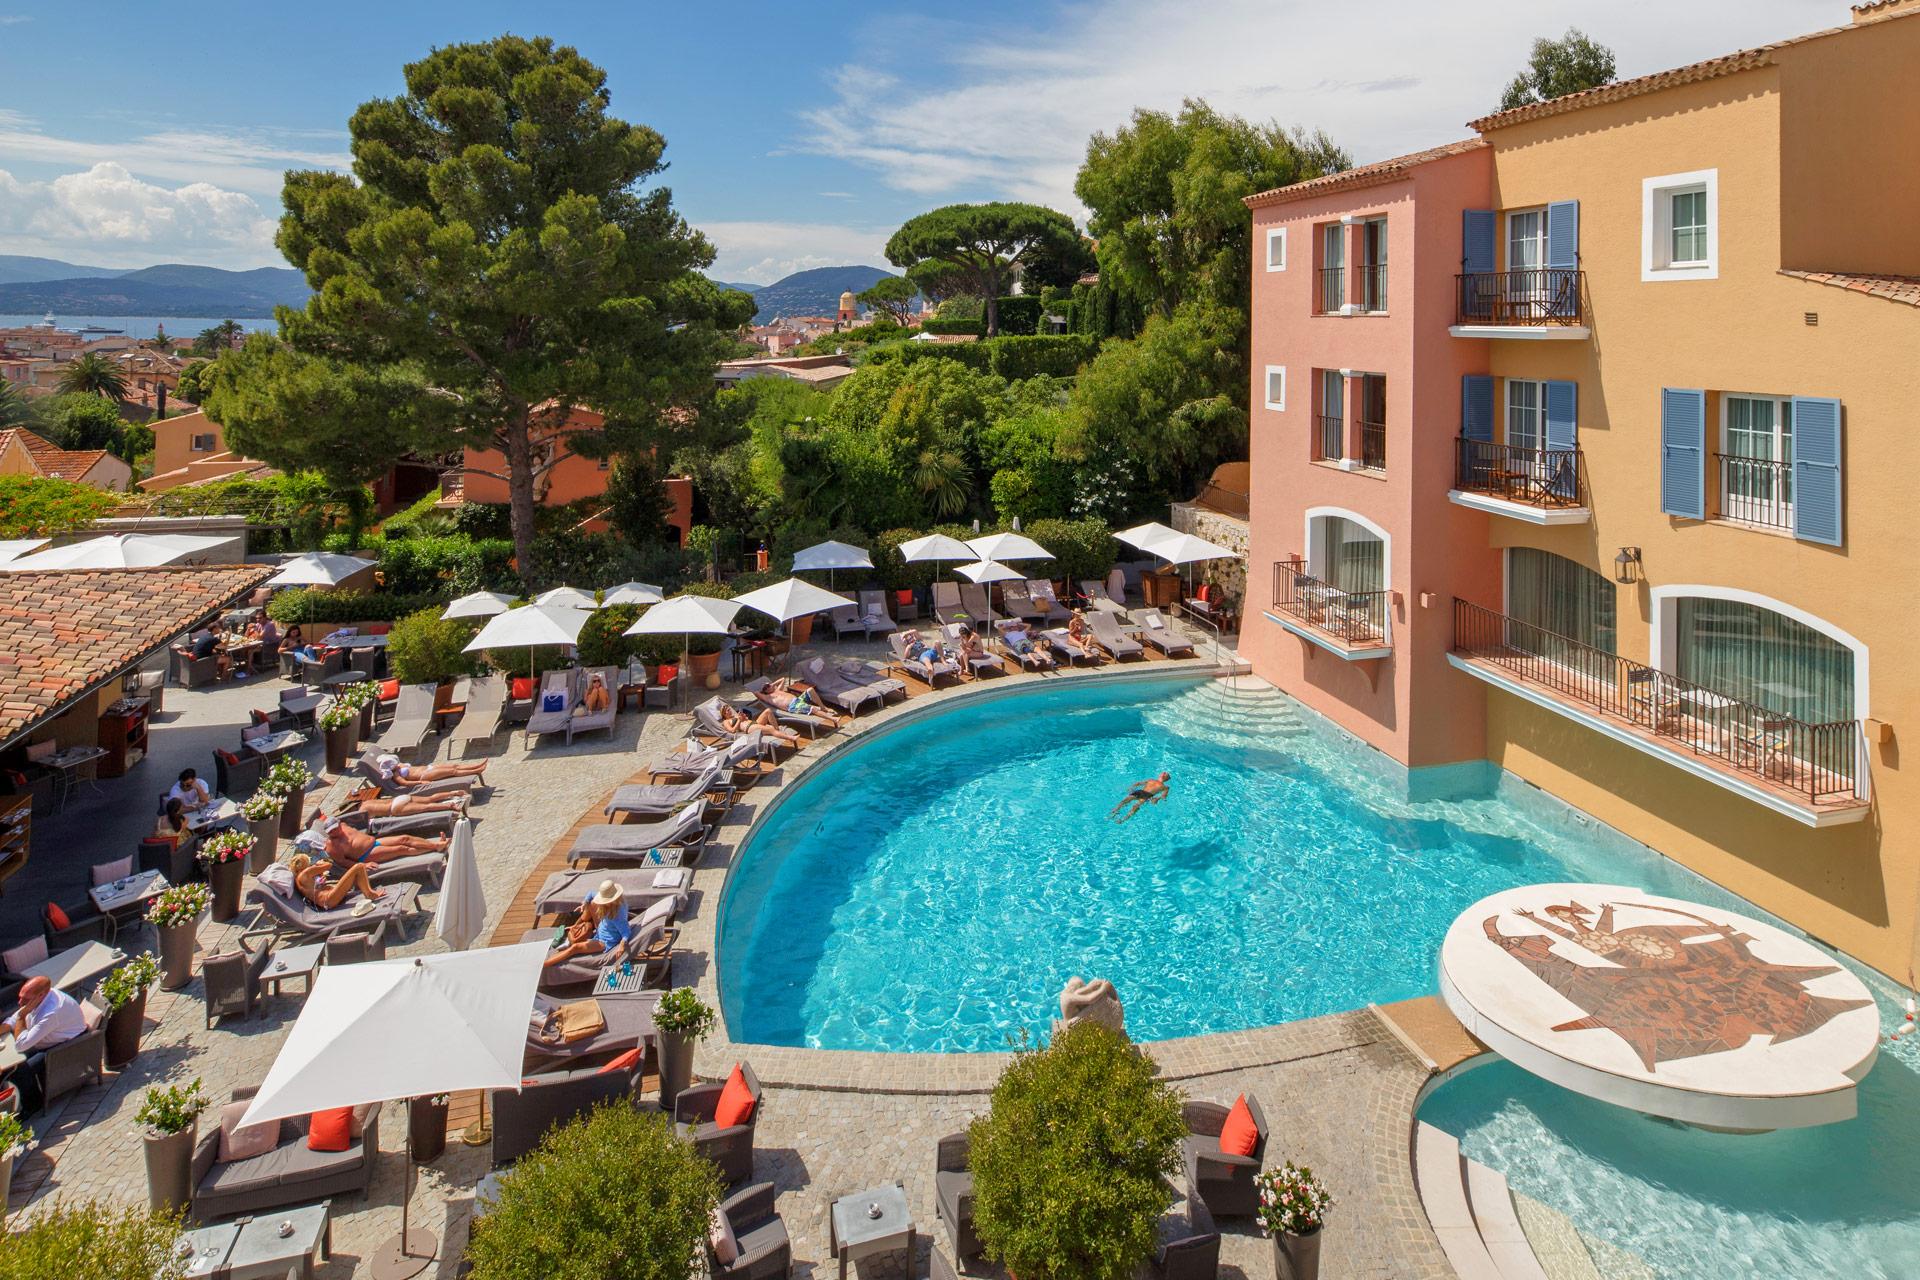 Hotel-Byblos-Saint-Tropez-palace